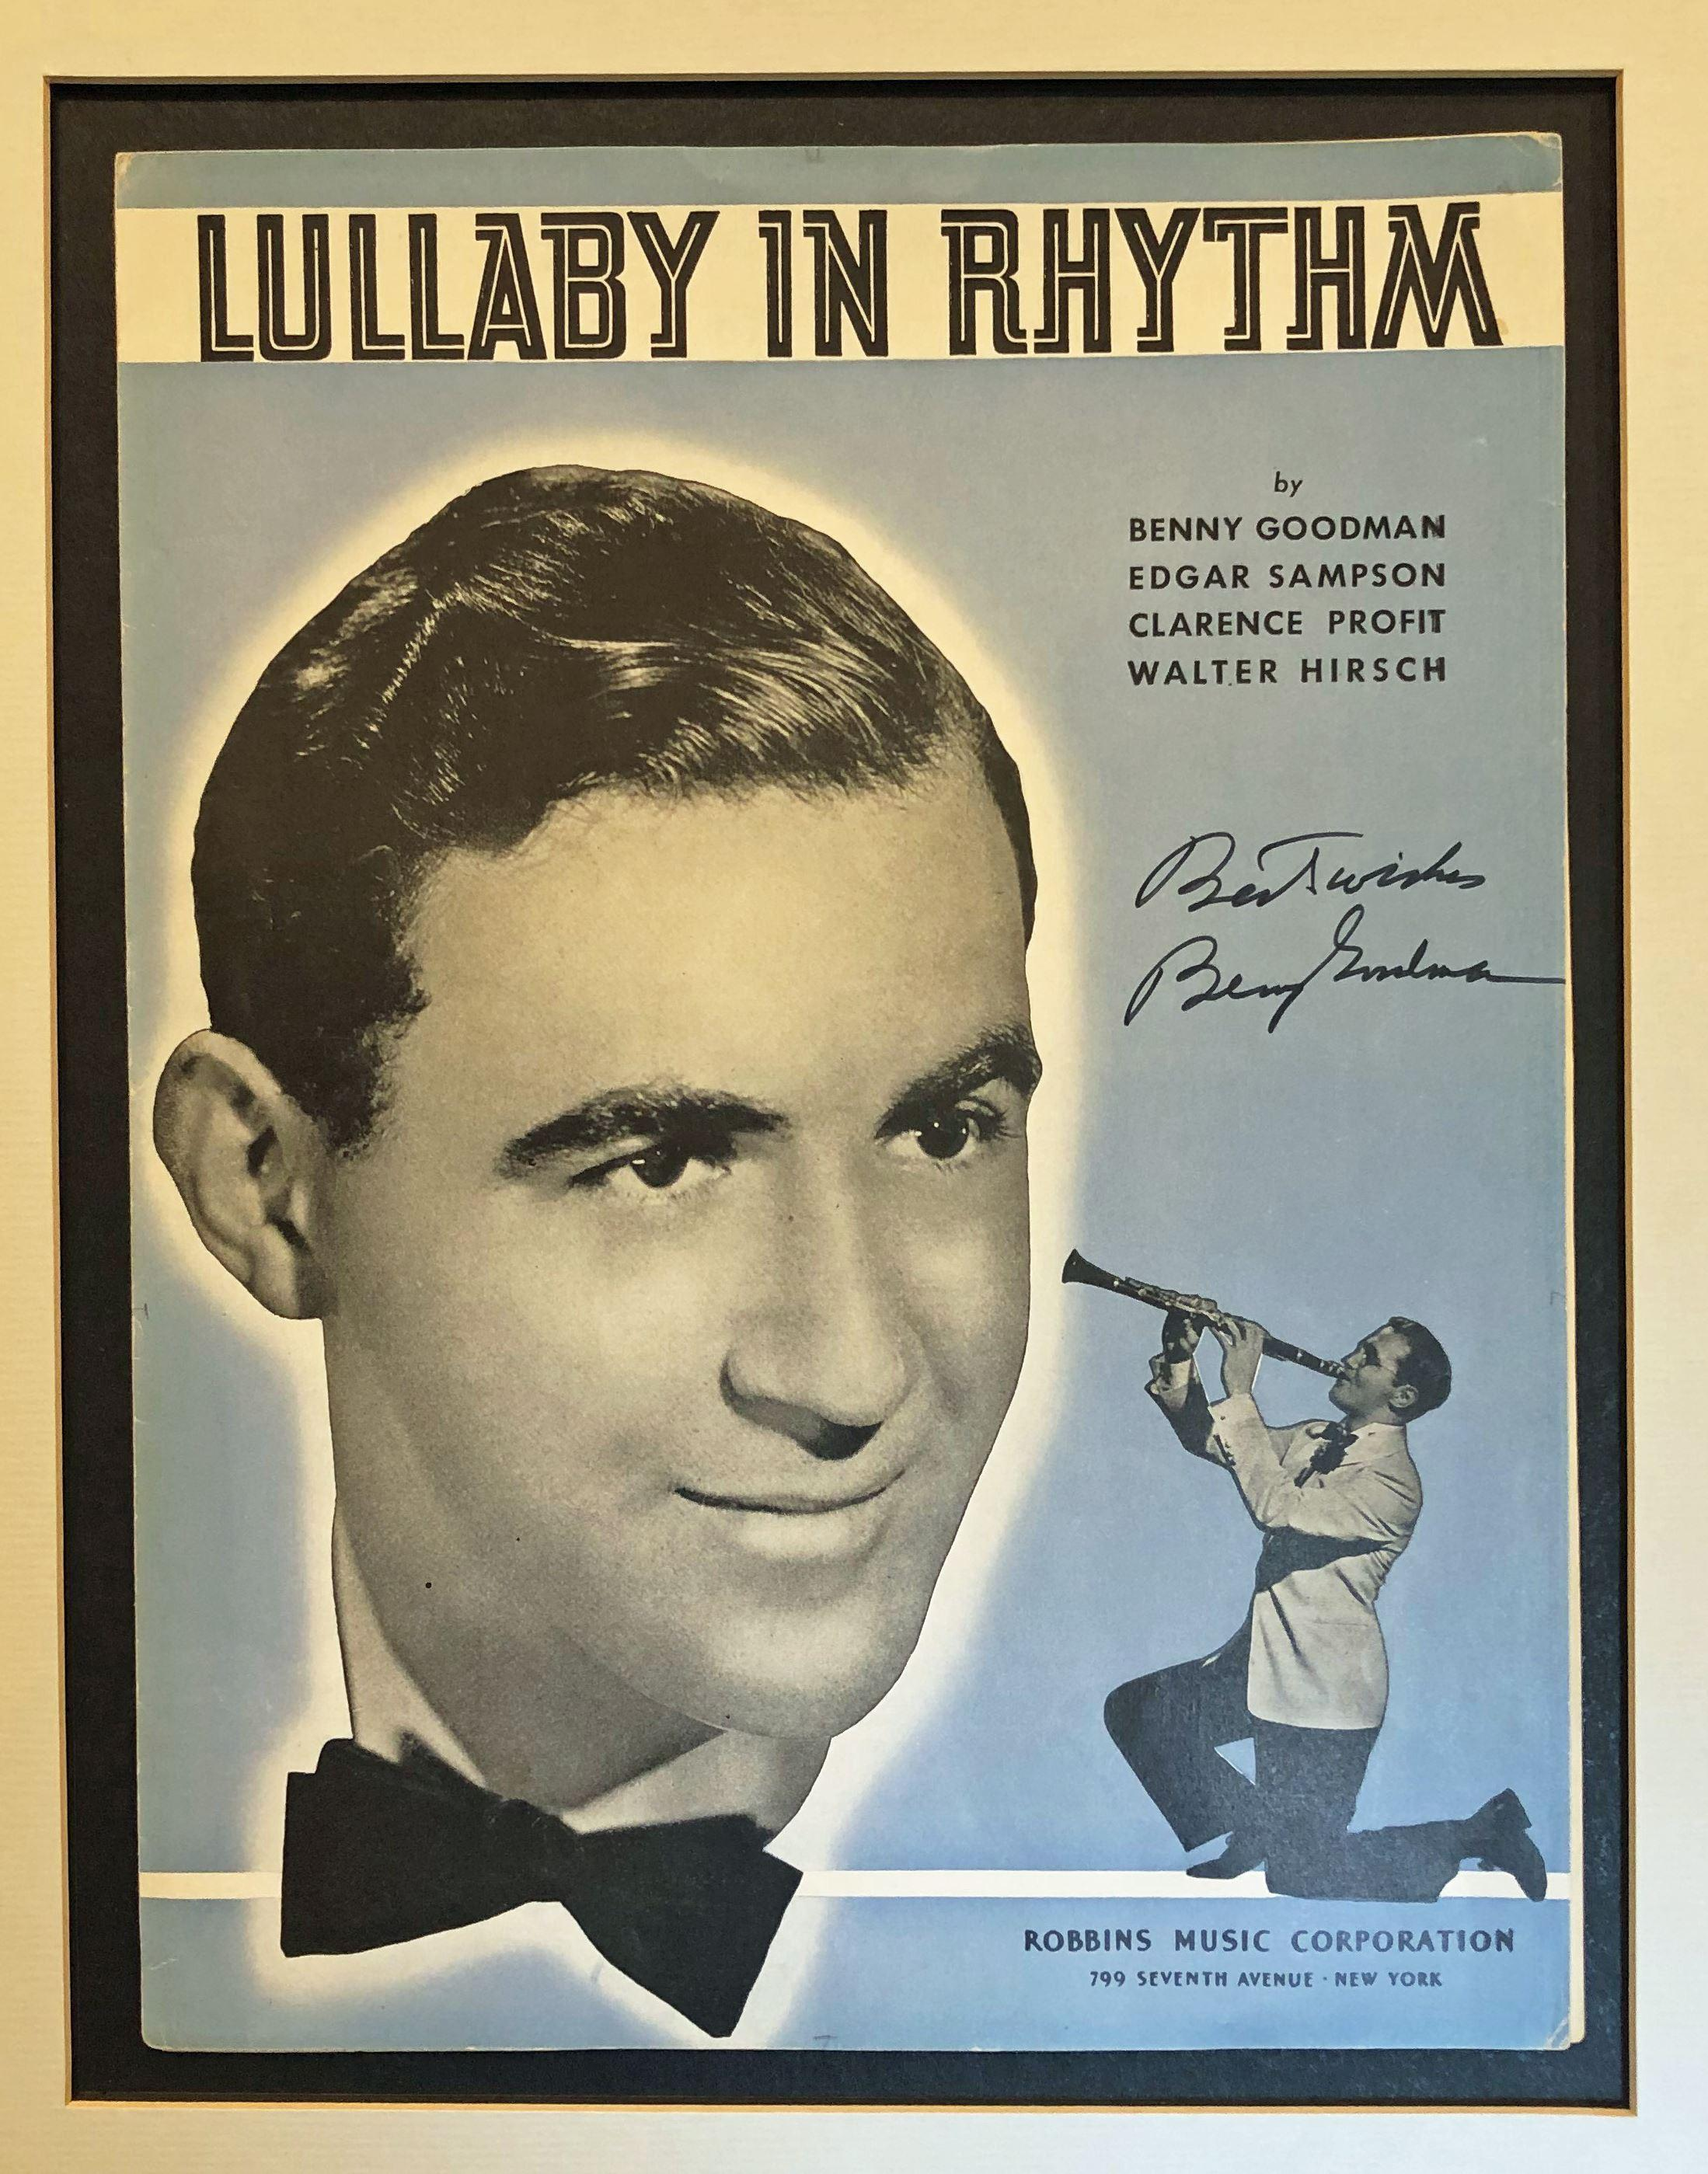 Benny Goodman Signed Sheet Music, Ready for Framing